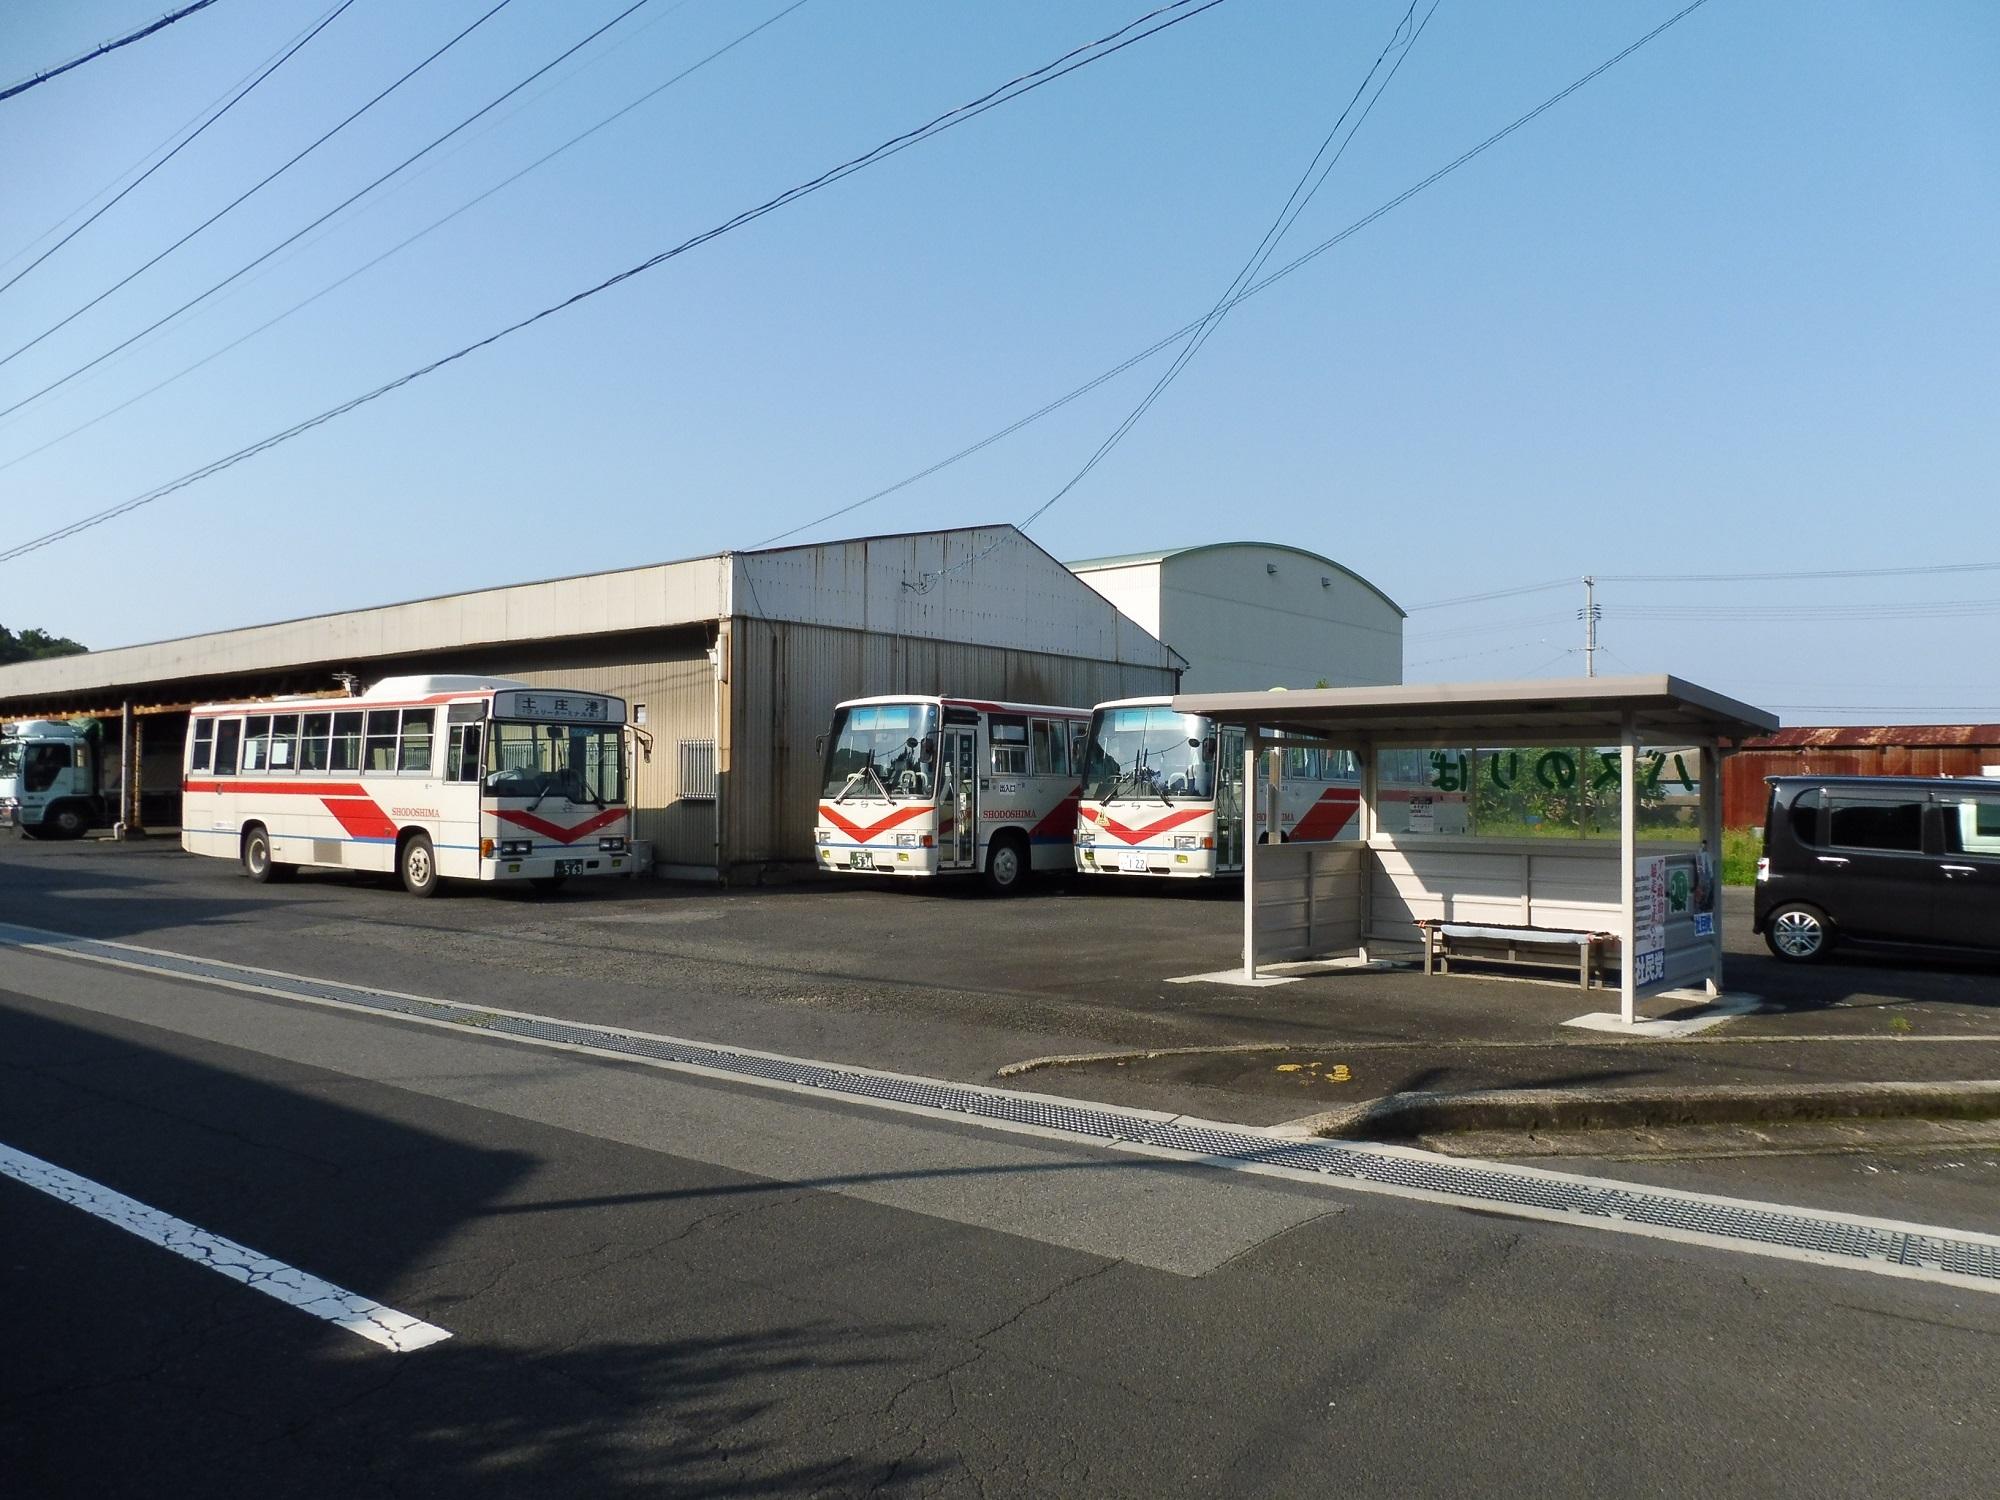 P1280807.jpg